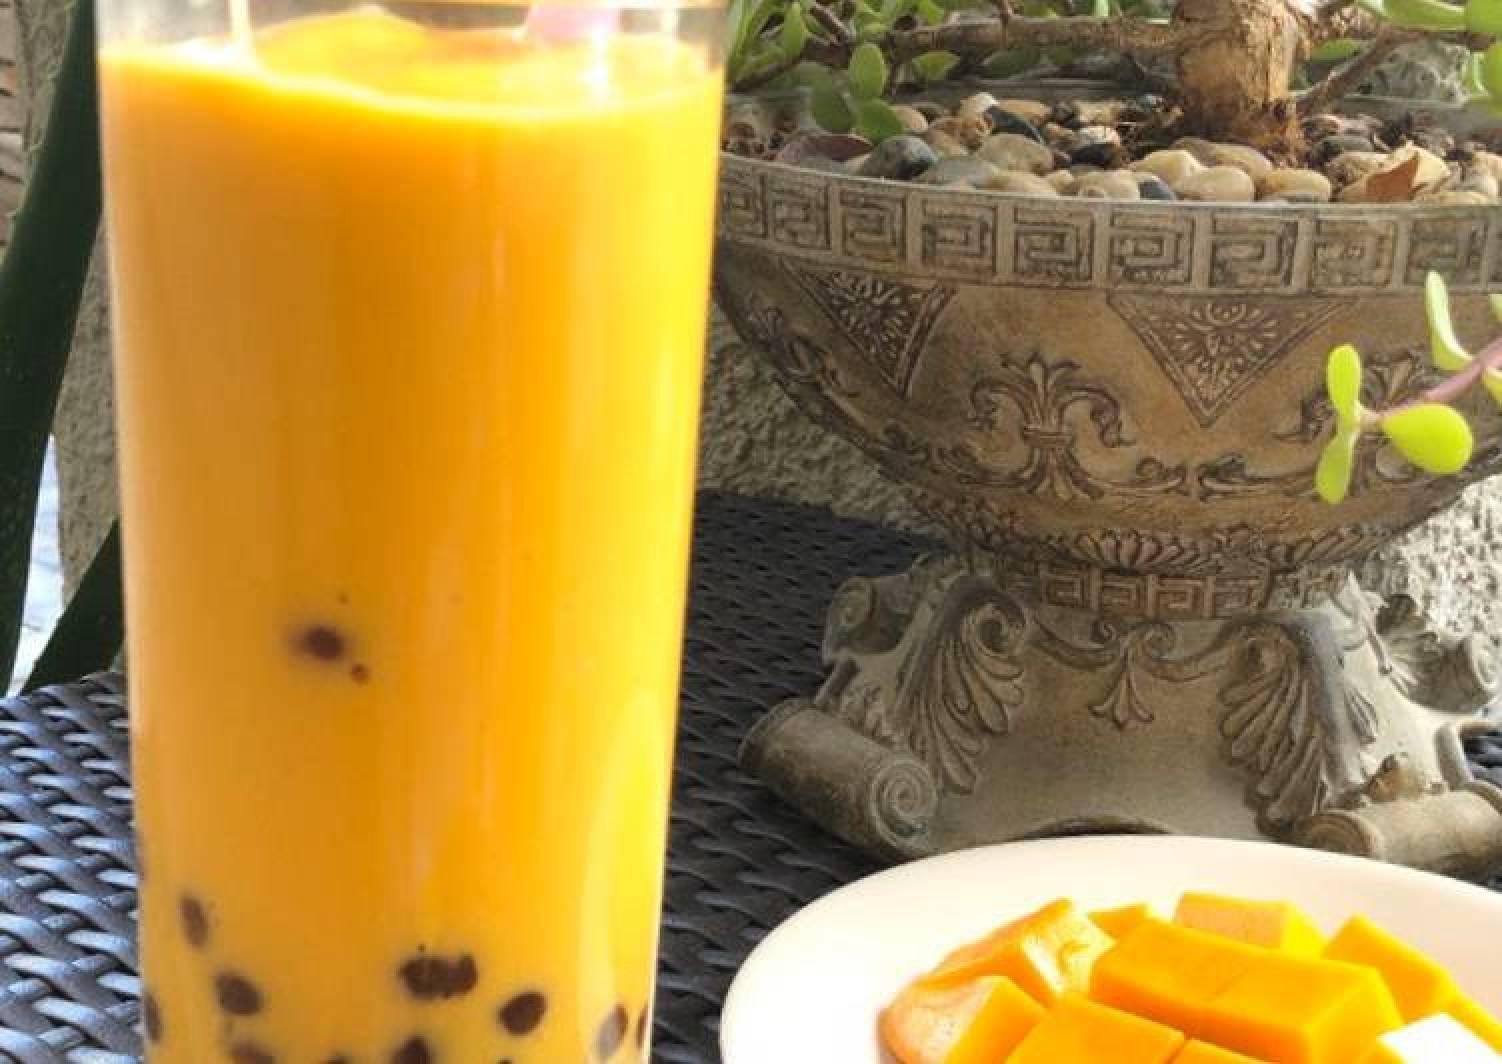 Mango Boba (Tapioca pearl) Smoothie